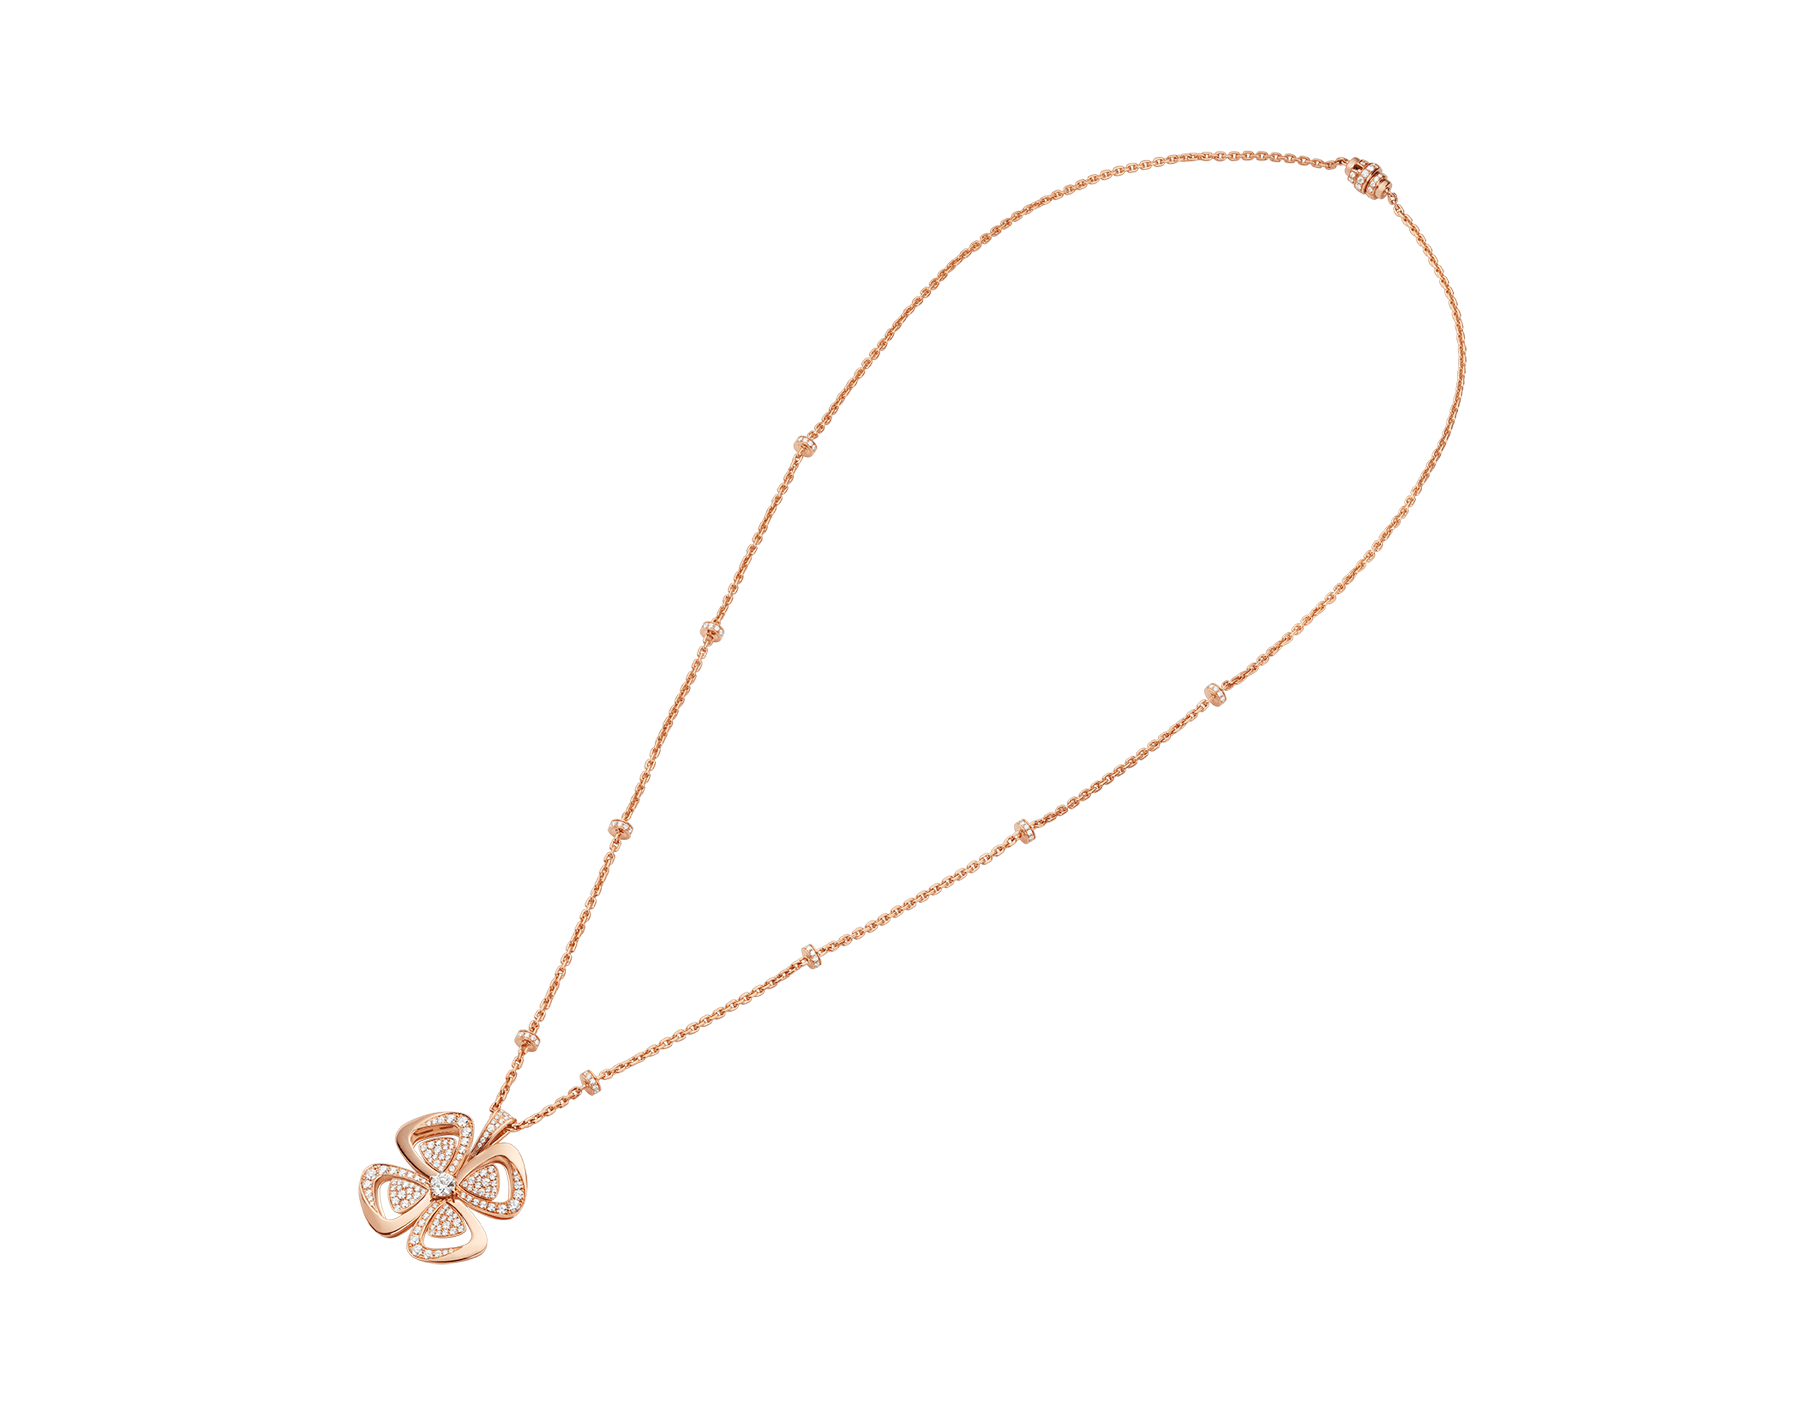 Collar Fiorever en oro rosa de 18qt con un diamante central redondo talla brillante y pavé de diamantes. 357218 image 2